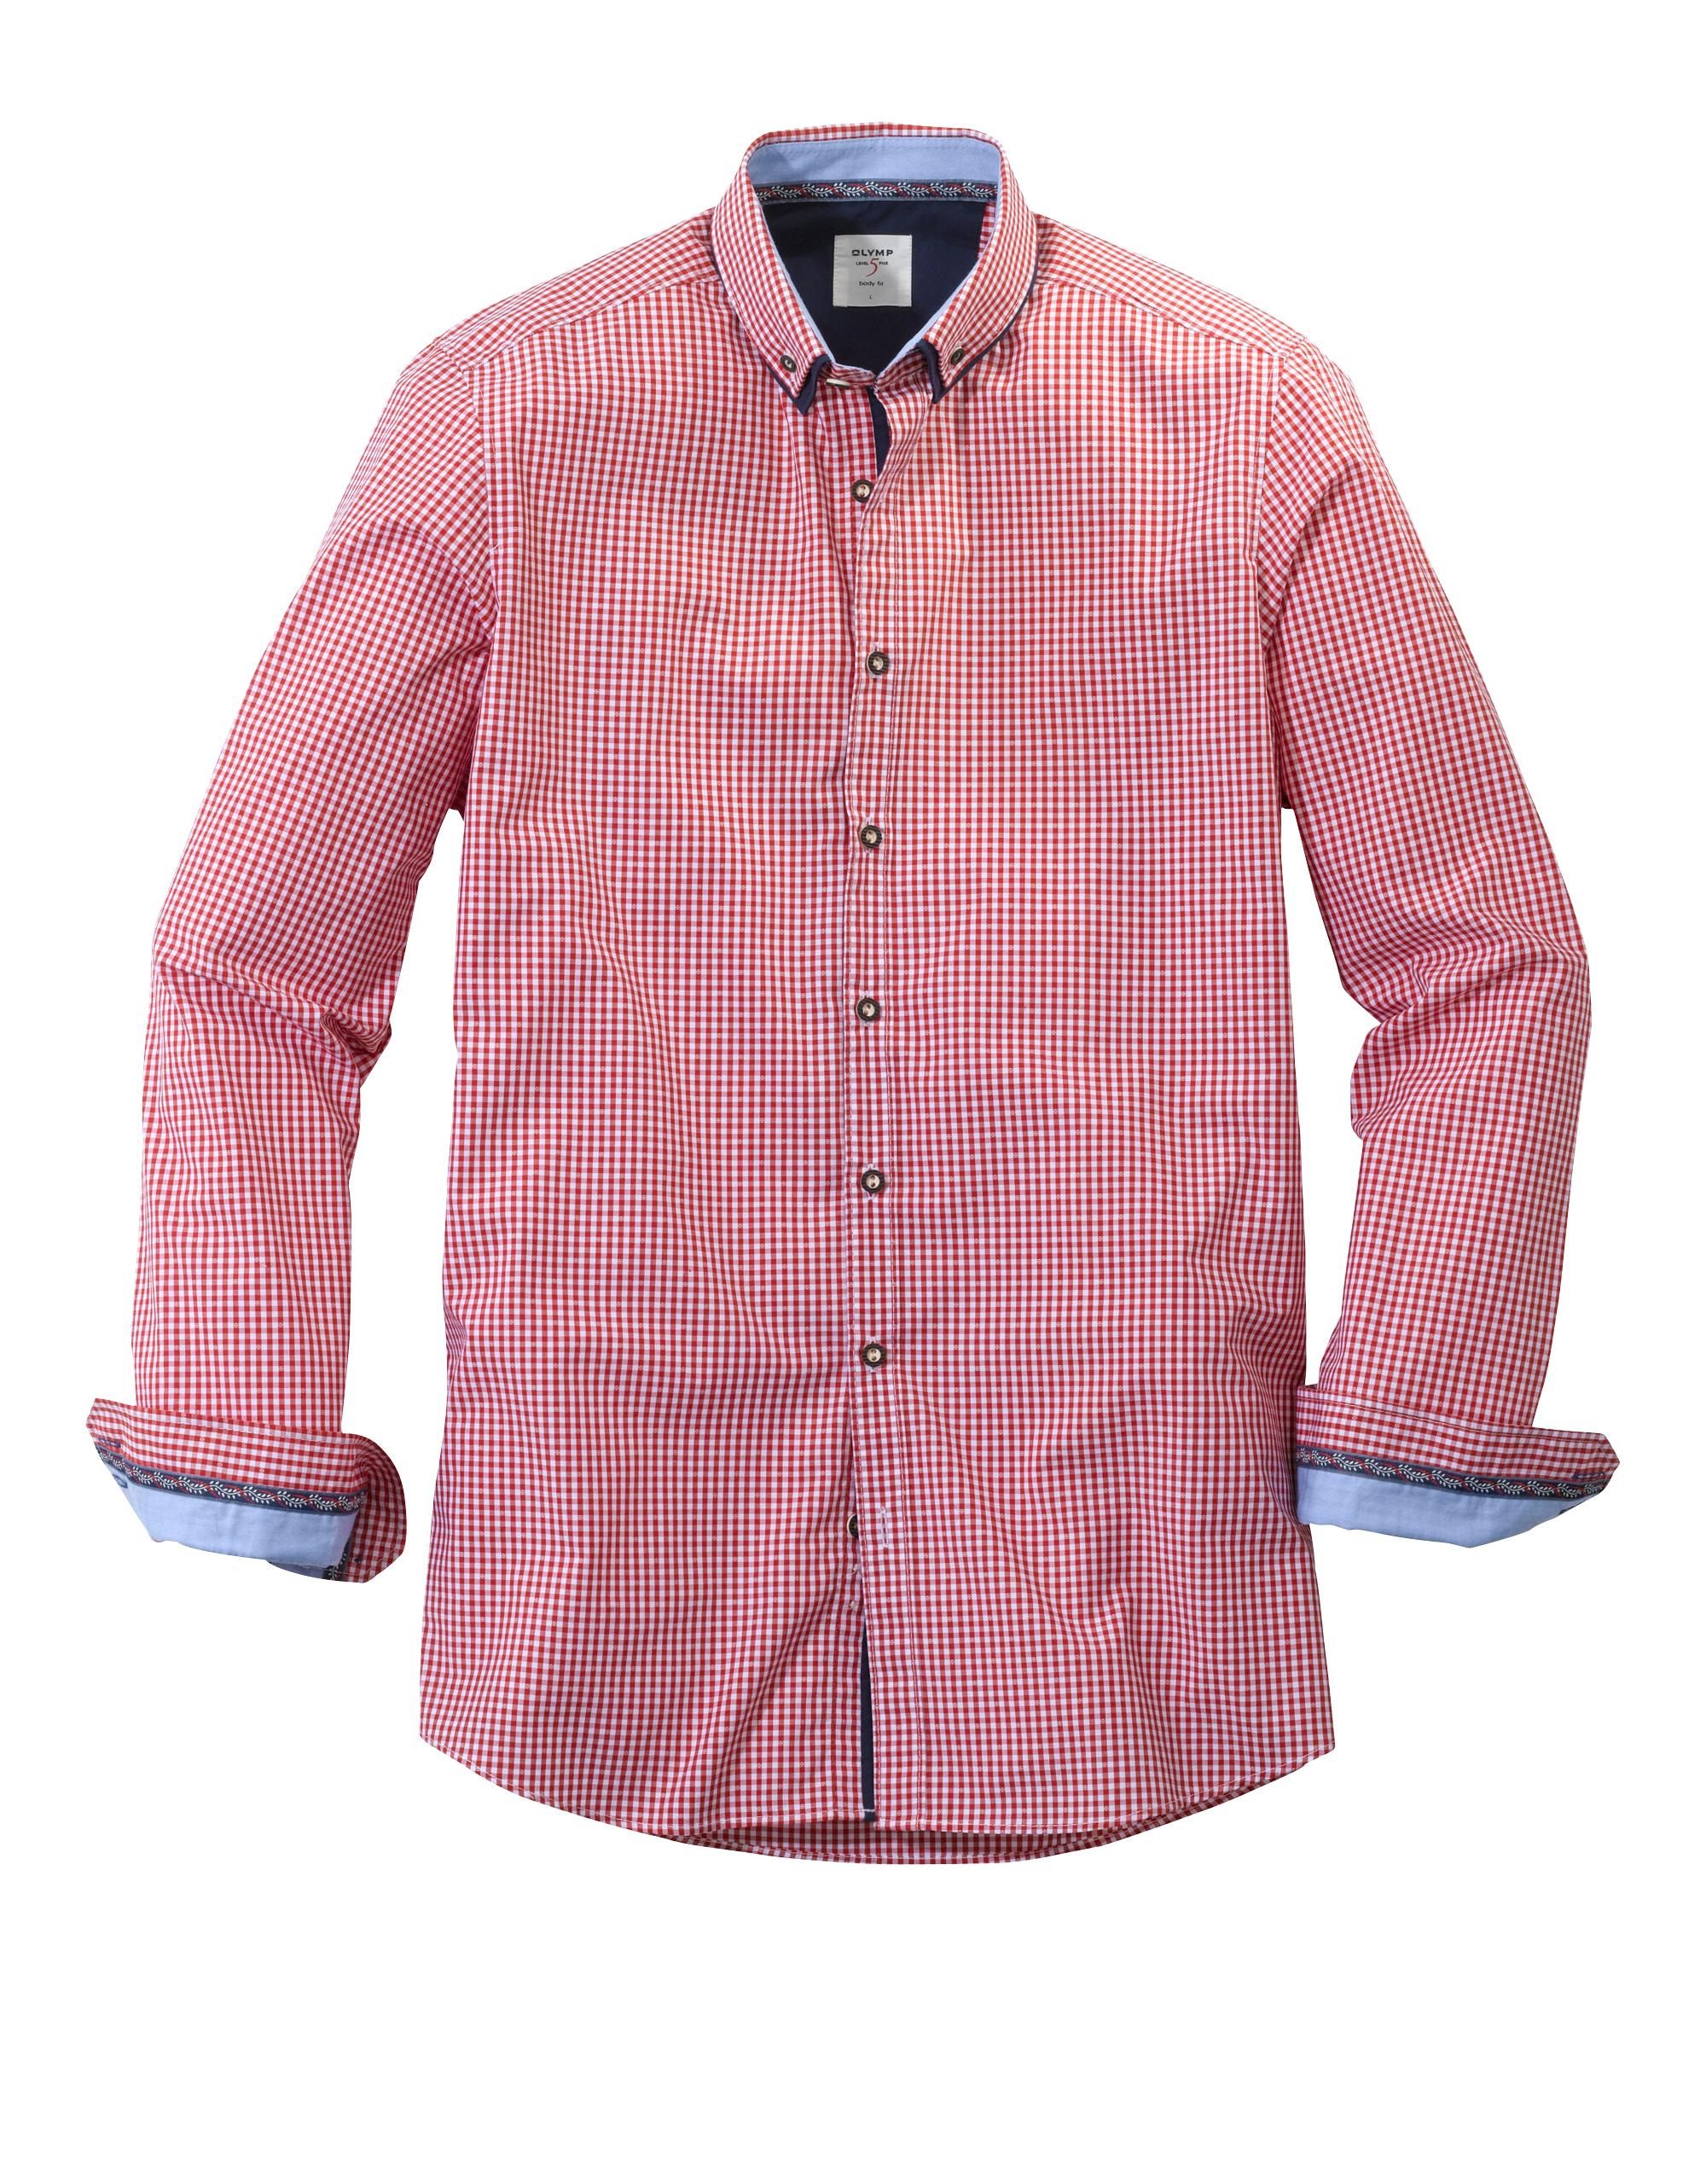 OLYMP Trachtenhemd, body fit, Button-down, Rot, XXL | Bekleidung > Hemden > Trachtenhemden | OLYMP